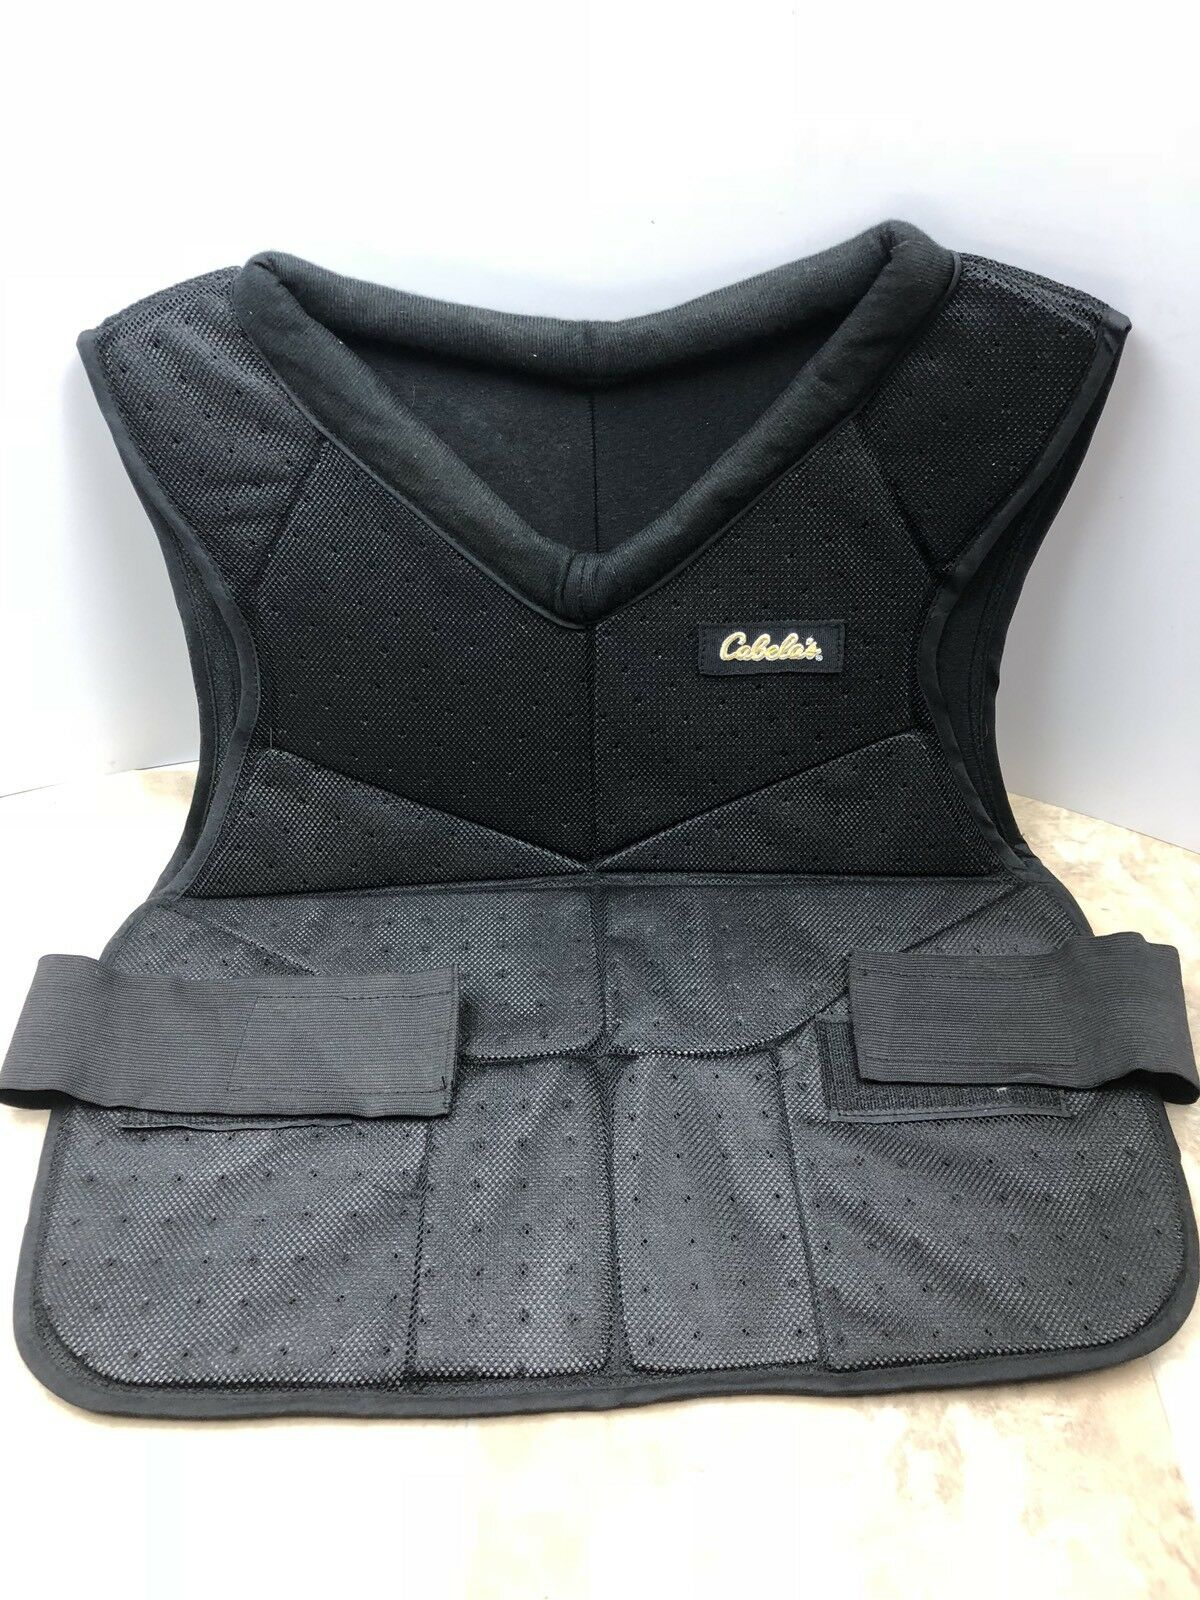 Cabela's Hunting Shooting Vest Men's Size Large Excellent Condition Mesh